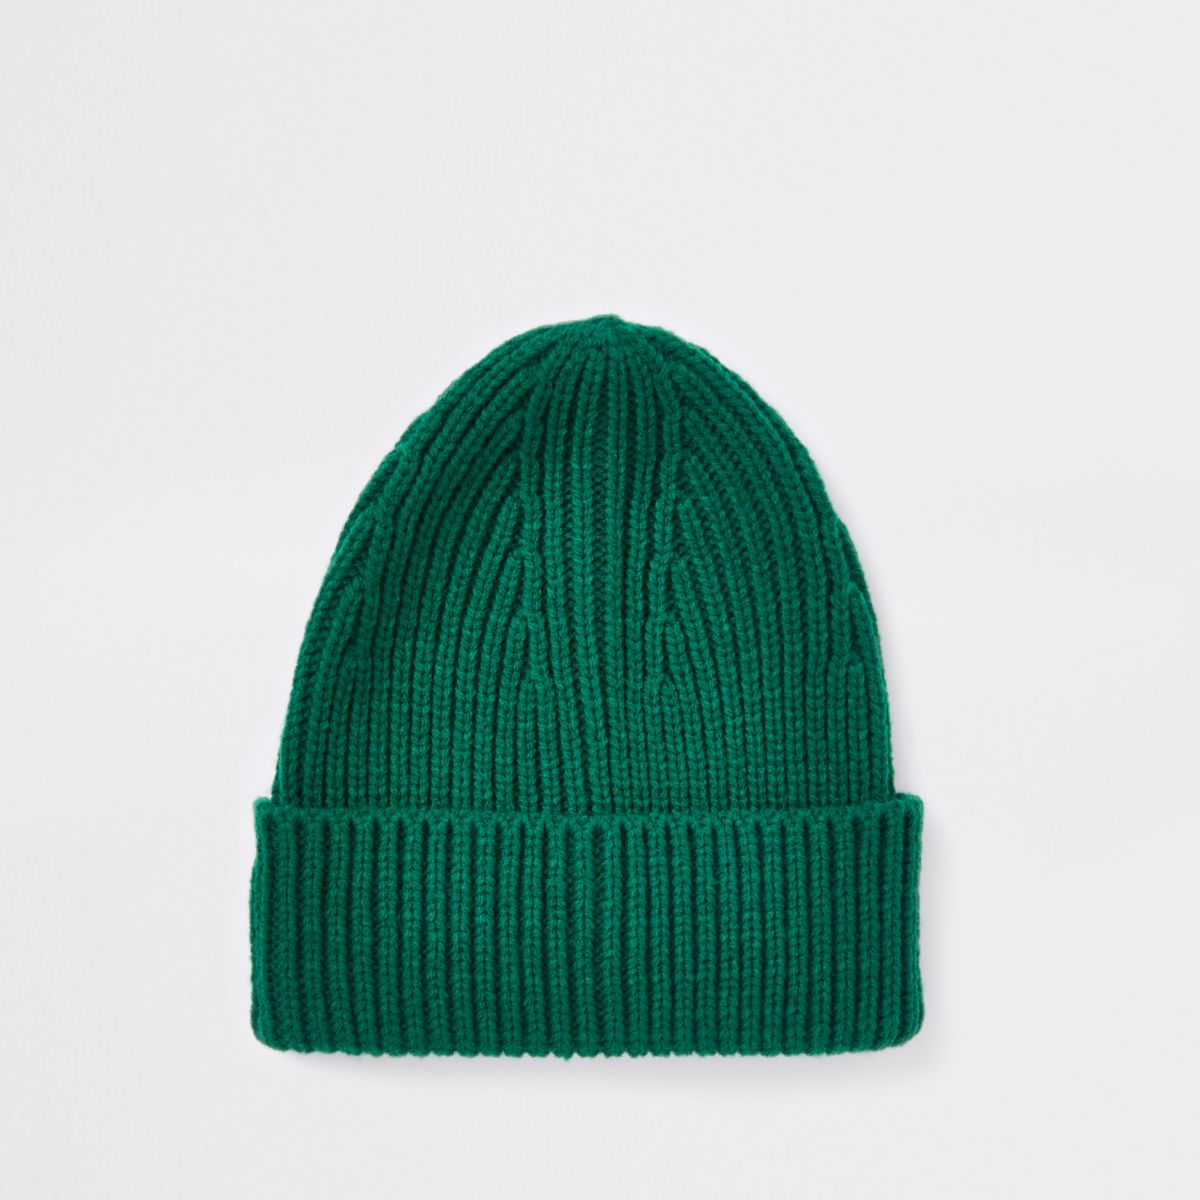 Green fisherman knit beanie hat